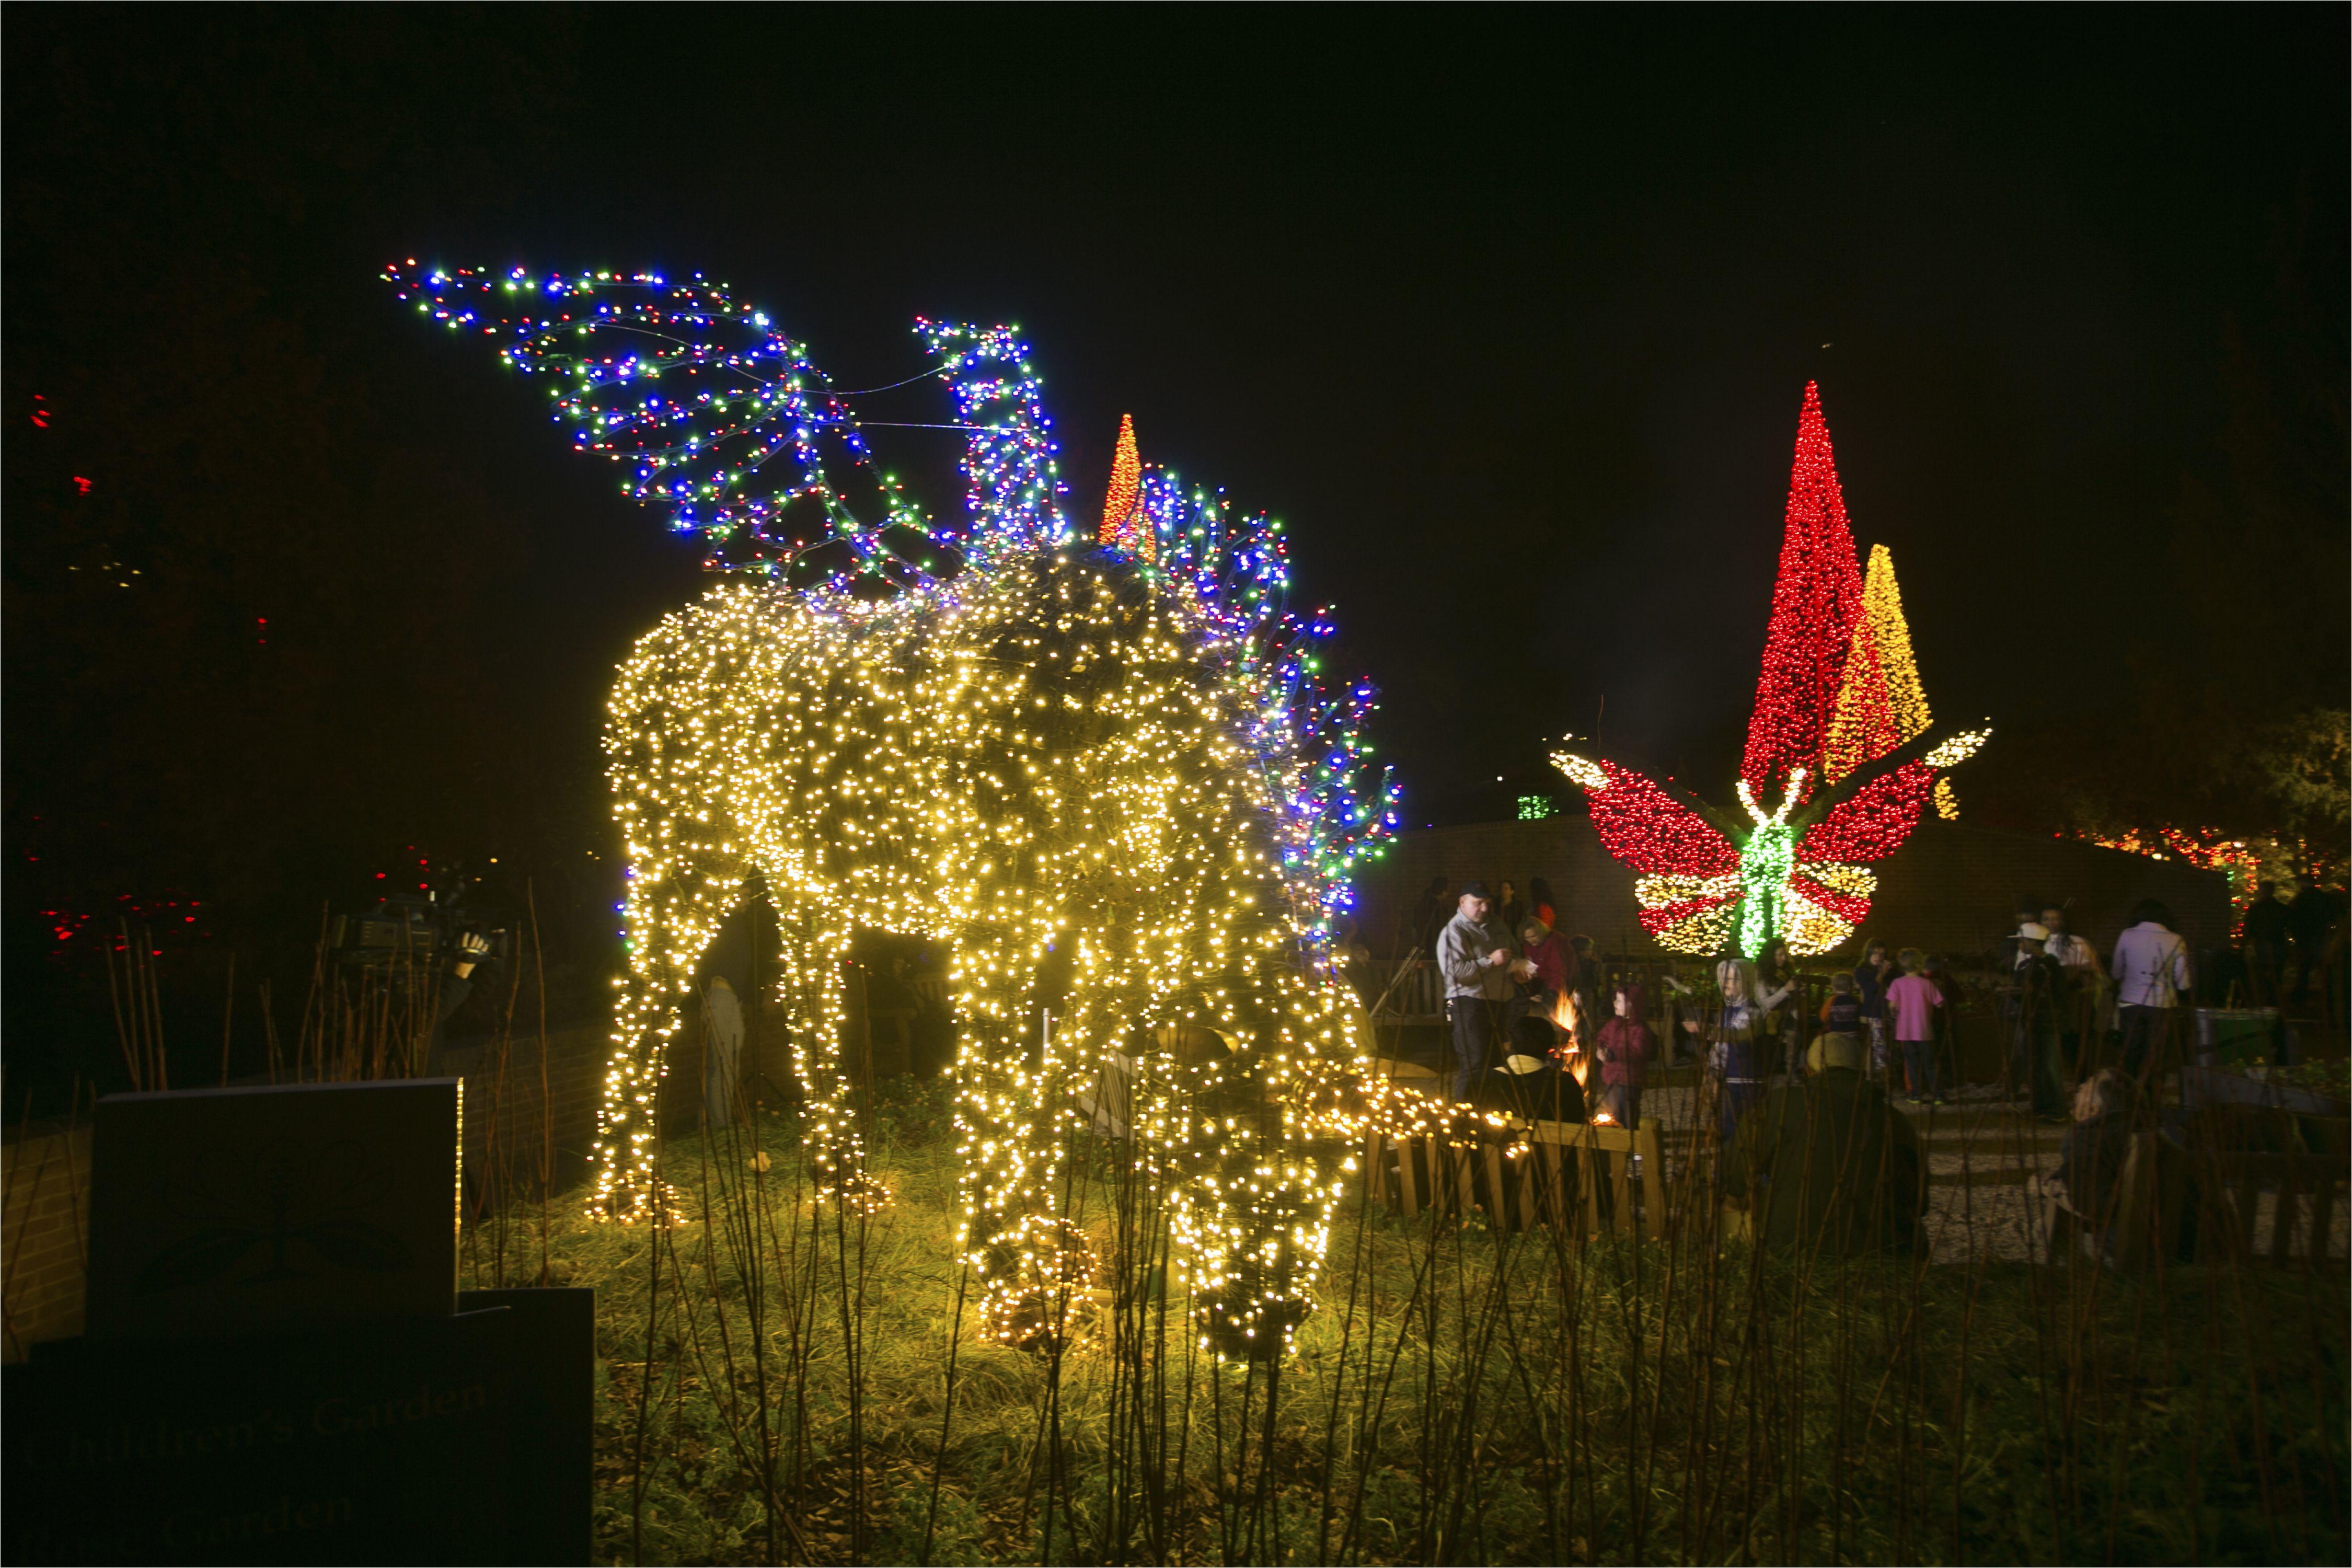 show surprising garden lights atlanta botanical garden in ice goddess at garden lights holiday nights